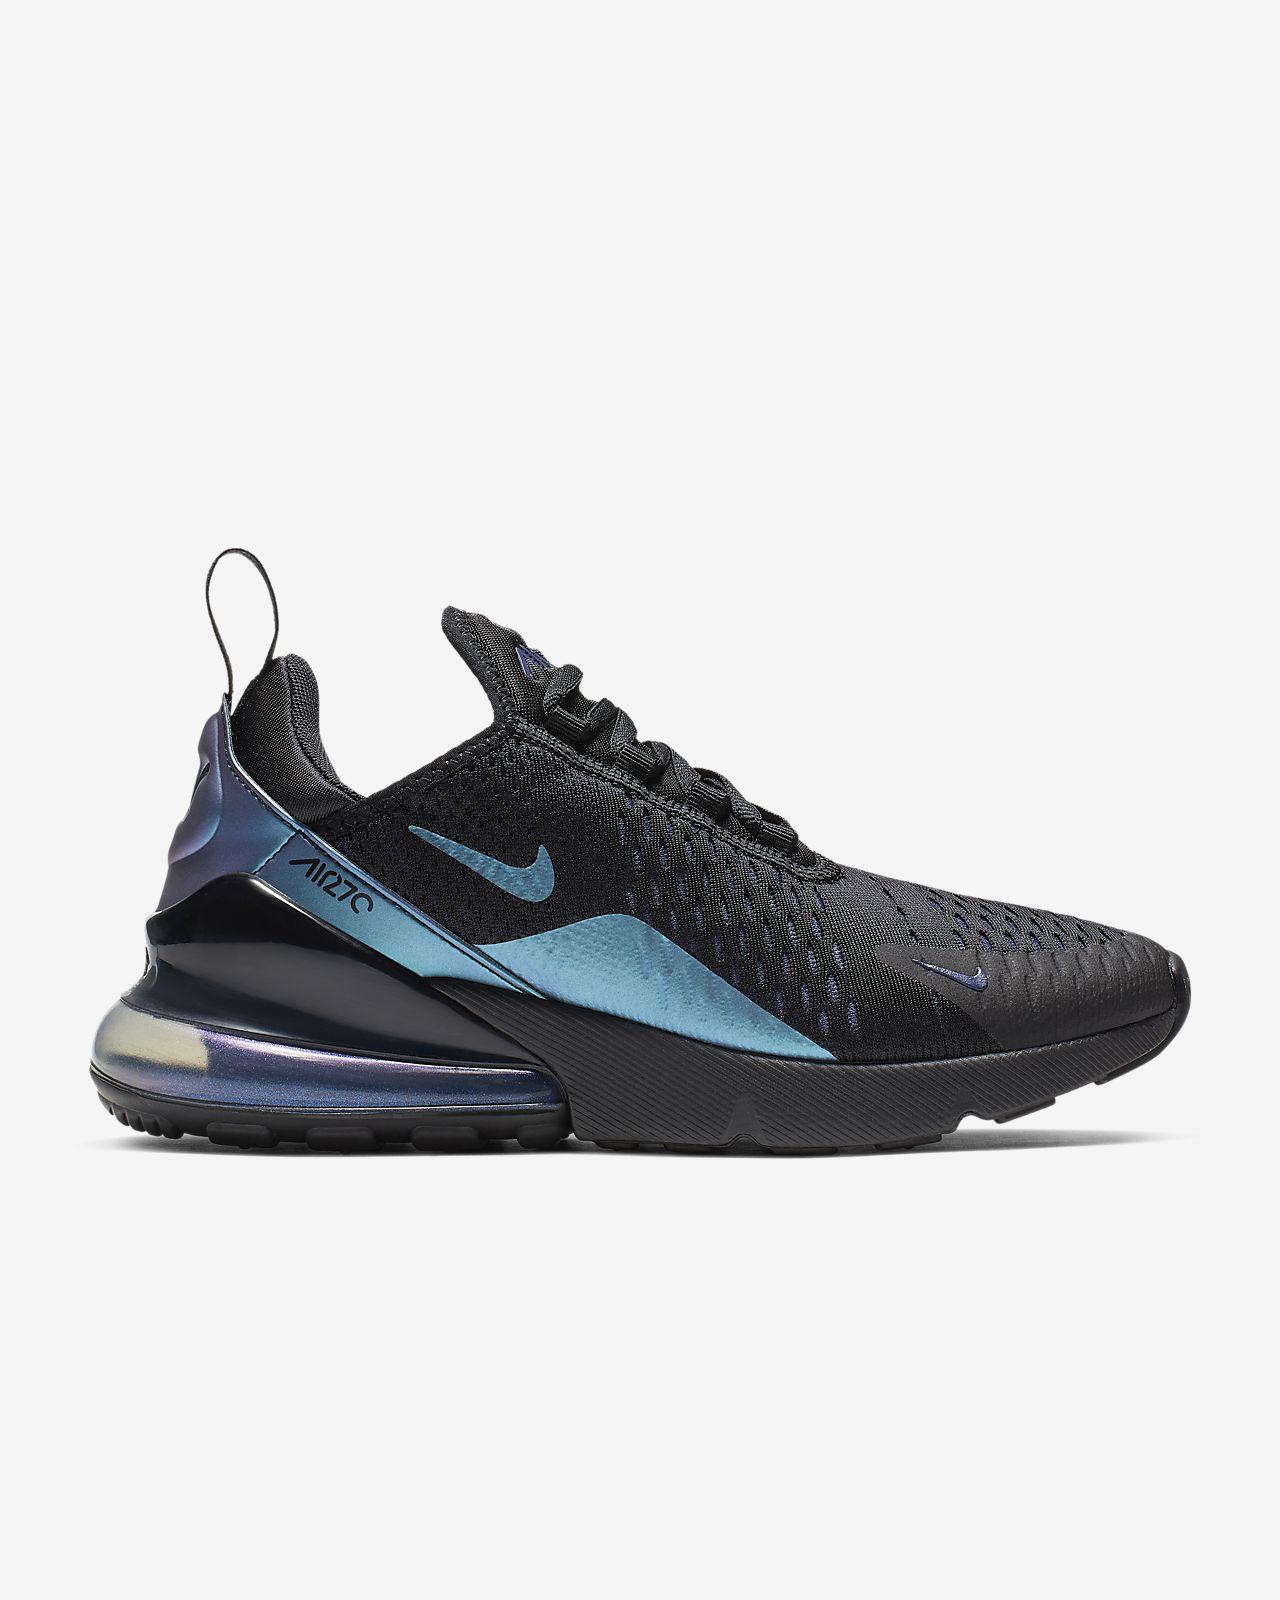 acb632e5323f Nike Air Max 270 Women s Shoe. Nike.com CH